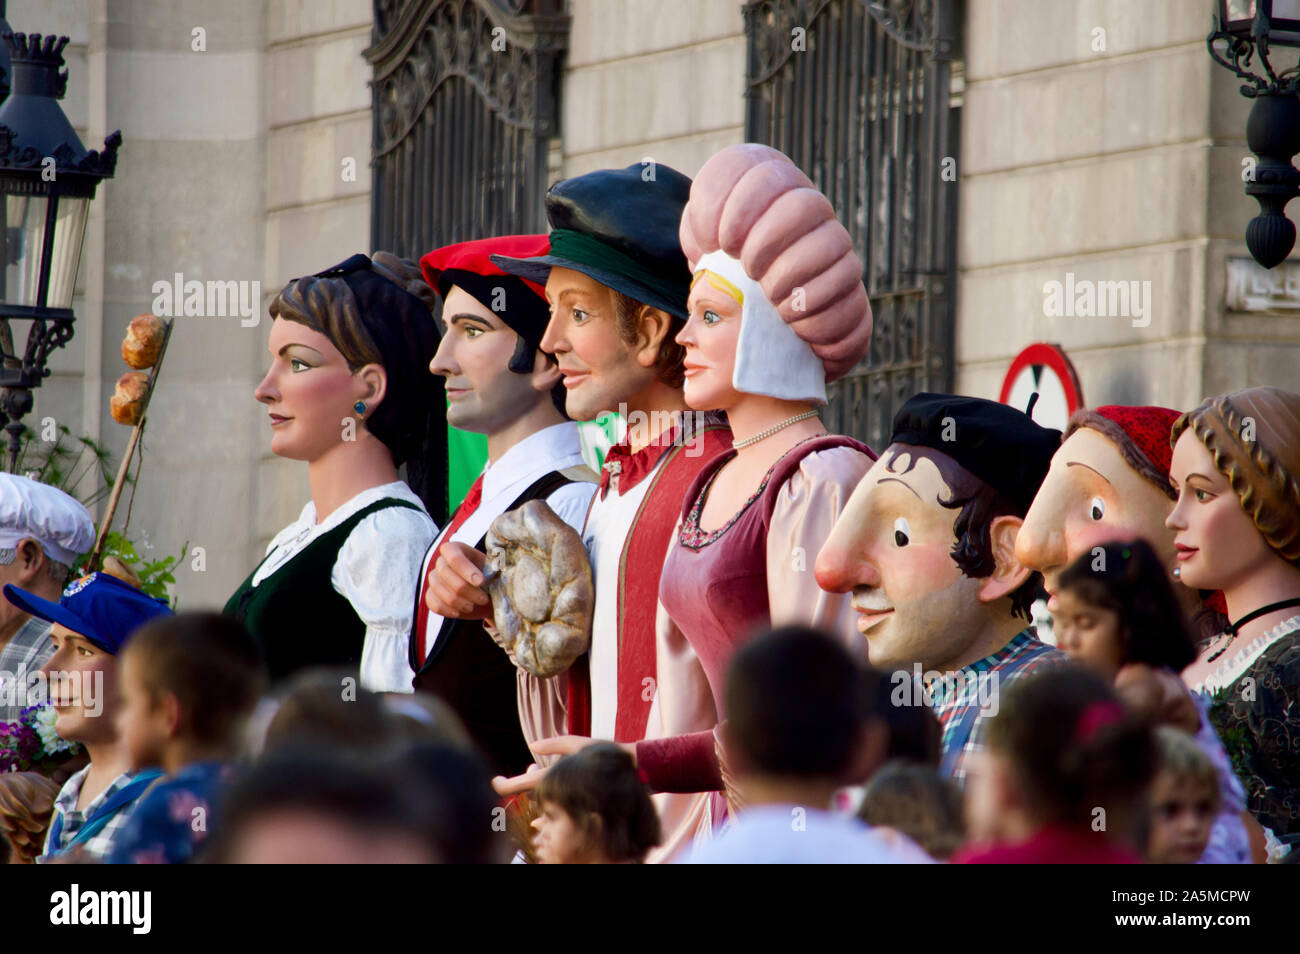 El desfile de gigantes durante la Merce Festival 2019 en la Plaça de Sant Jaume, en Barcelona, España Foto de stock